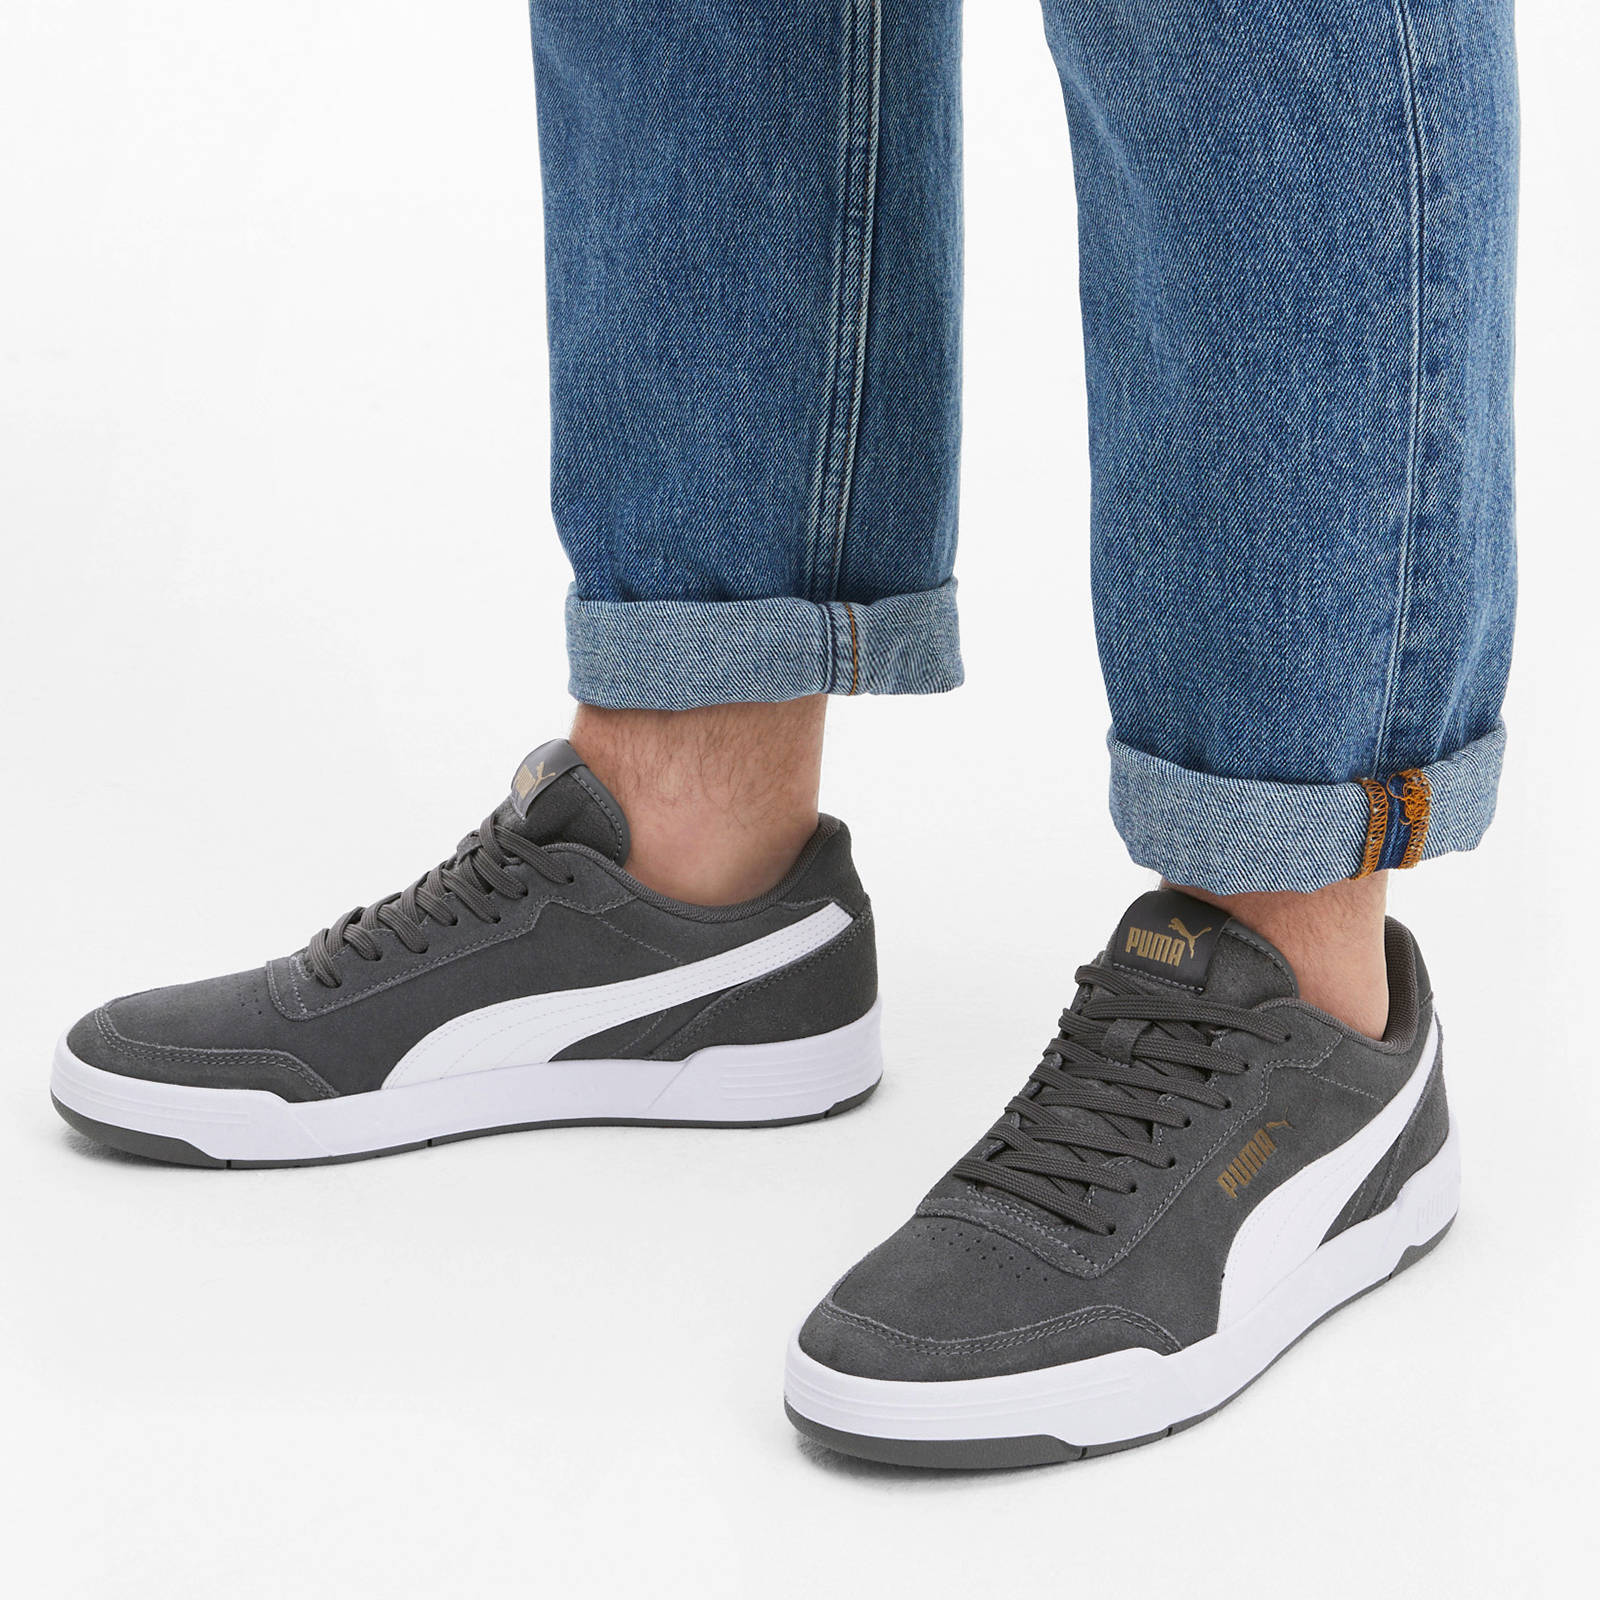 Puma Caracal SD suède sneakers grijs   wehkamp